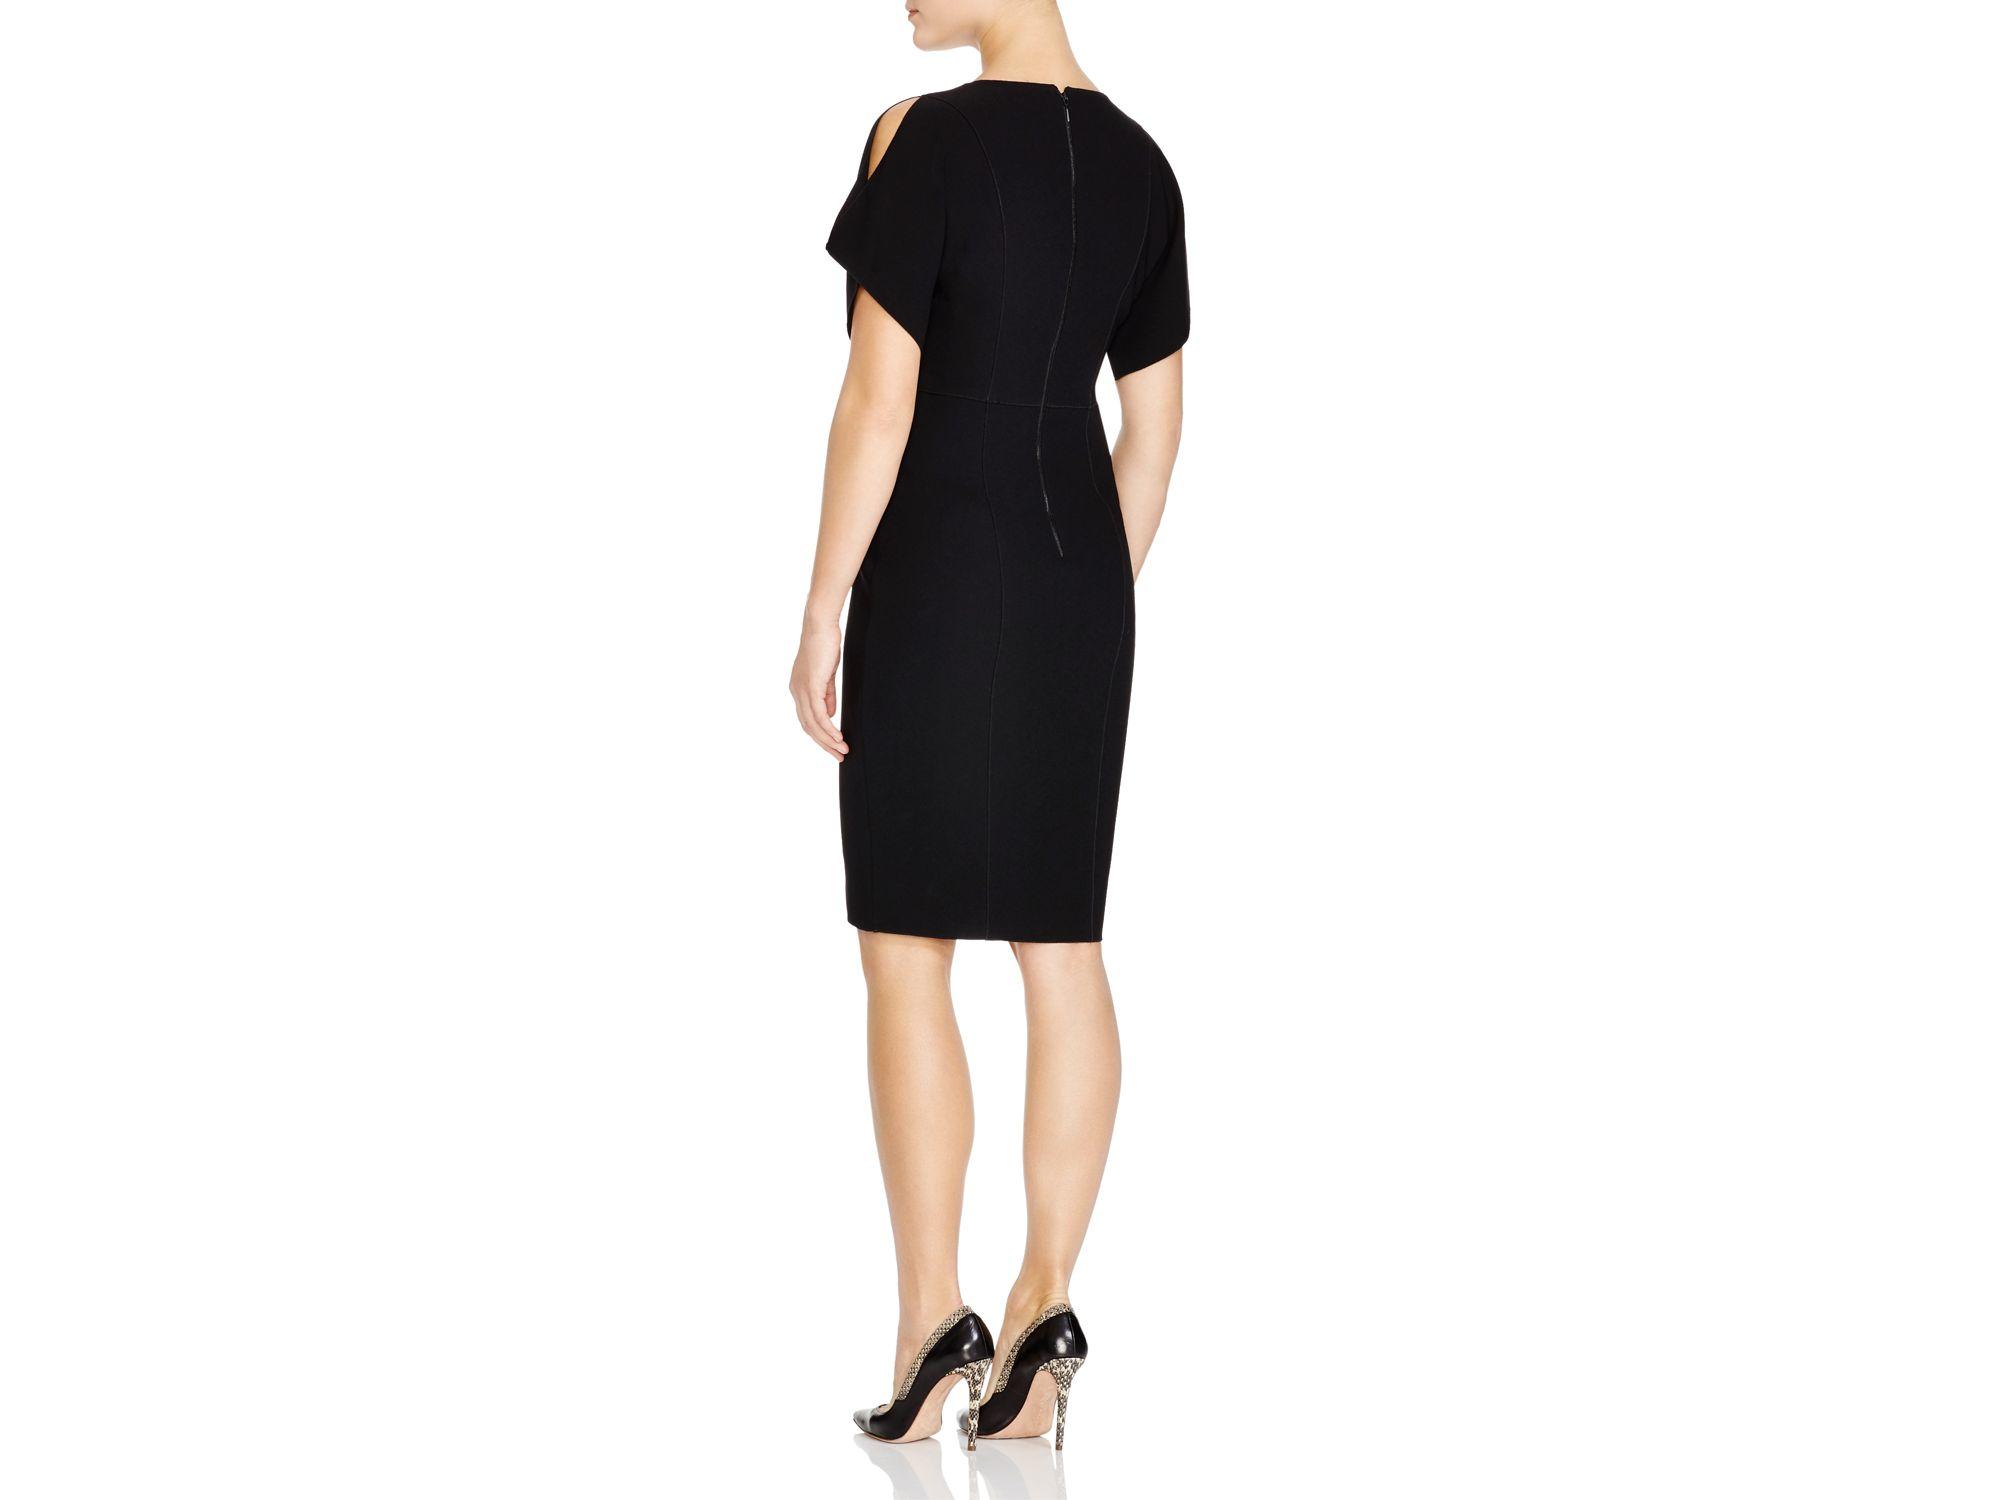 0873b0acf5aa Elie Tahari Lourdes Split Sleeve Dress in Black - Lyst